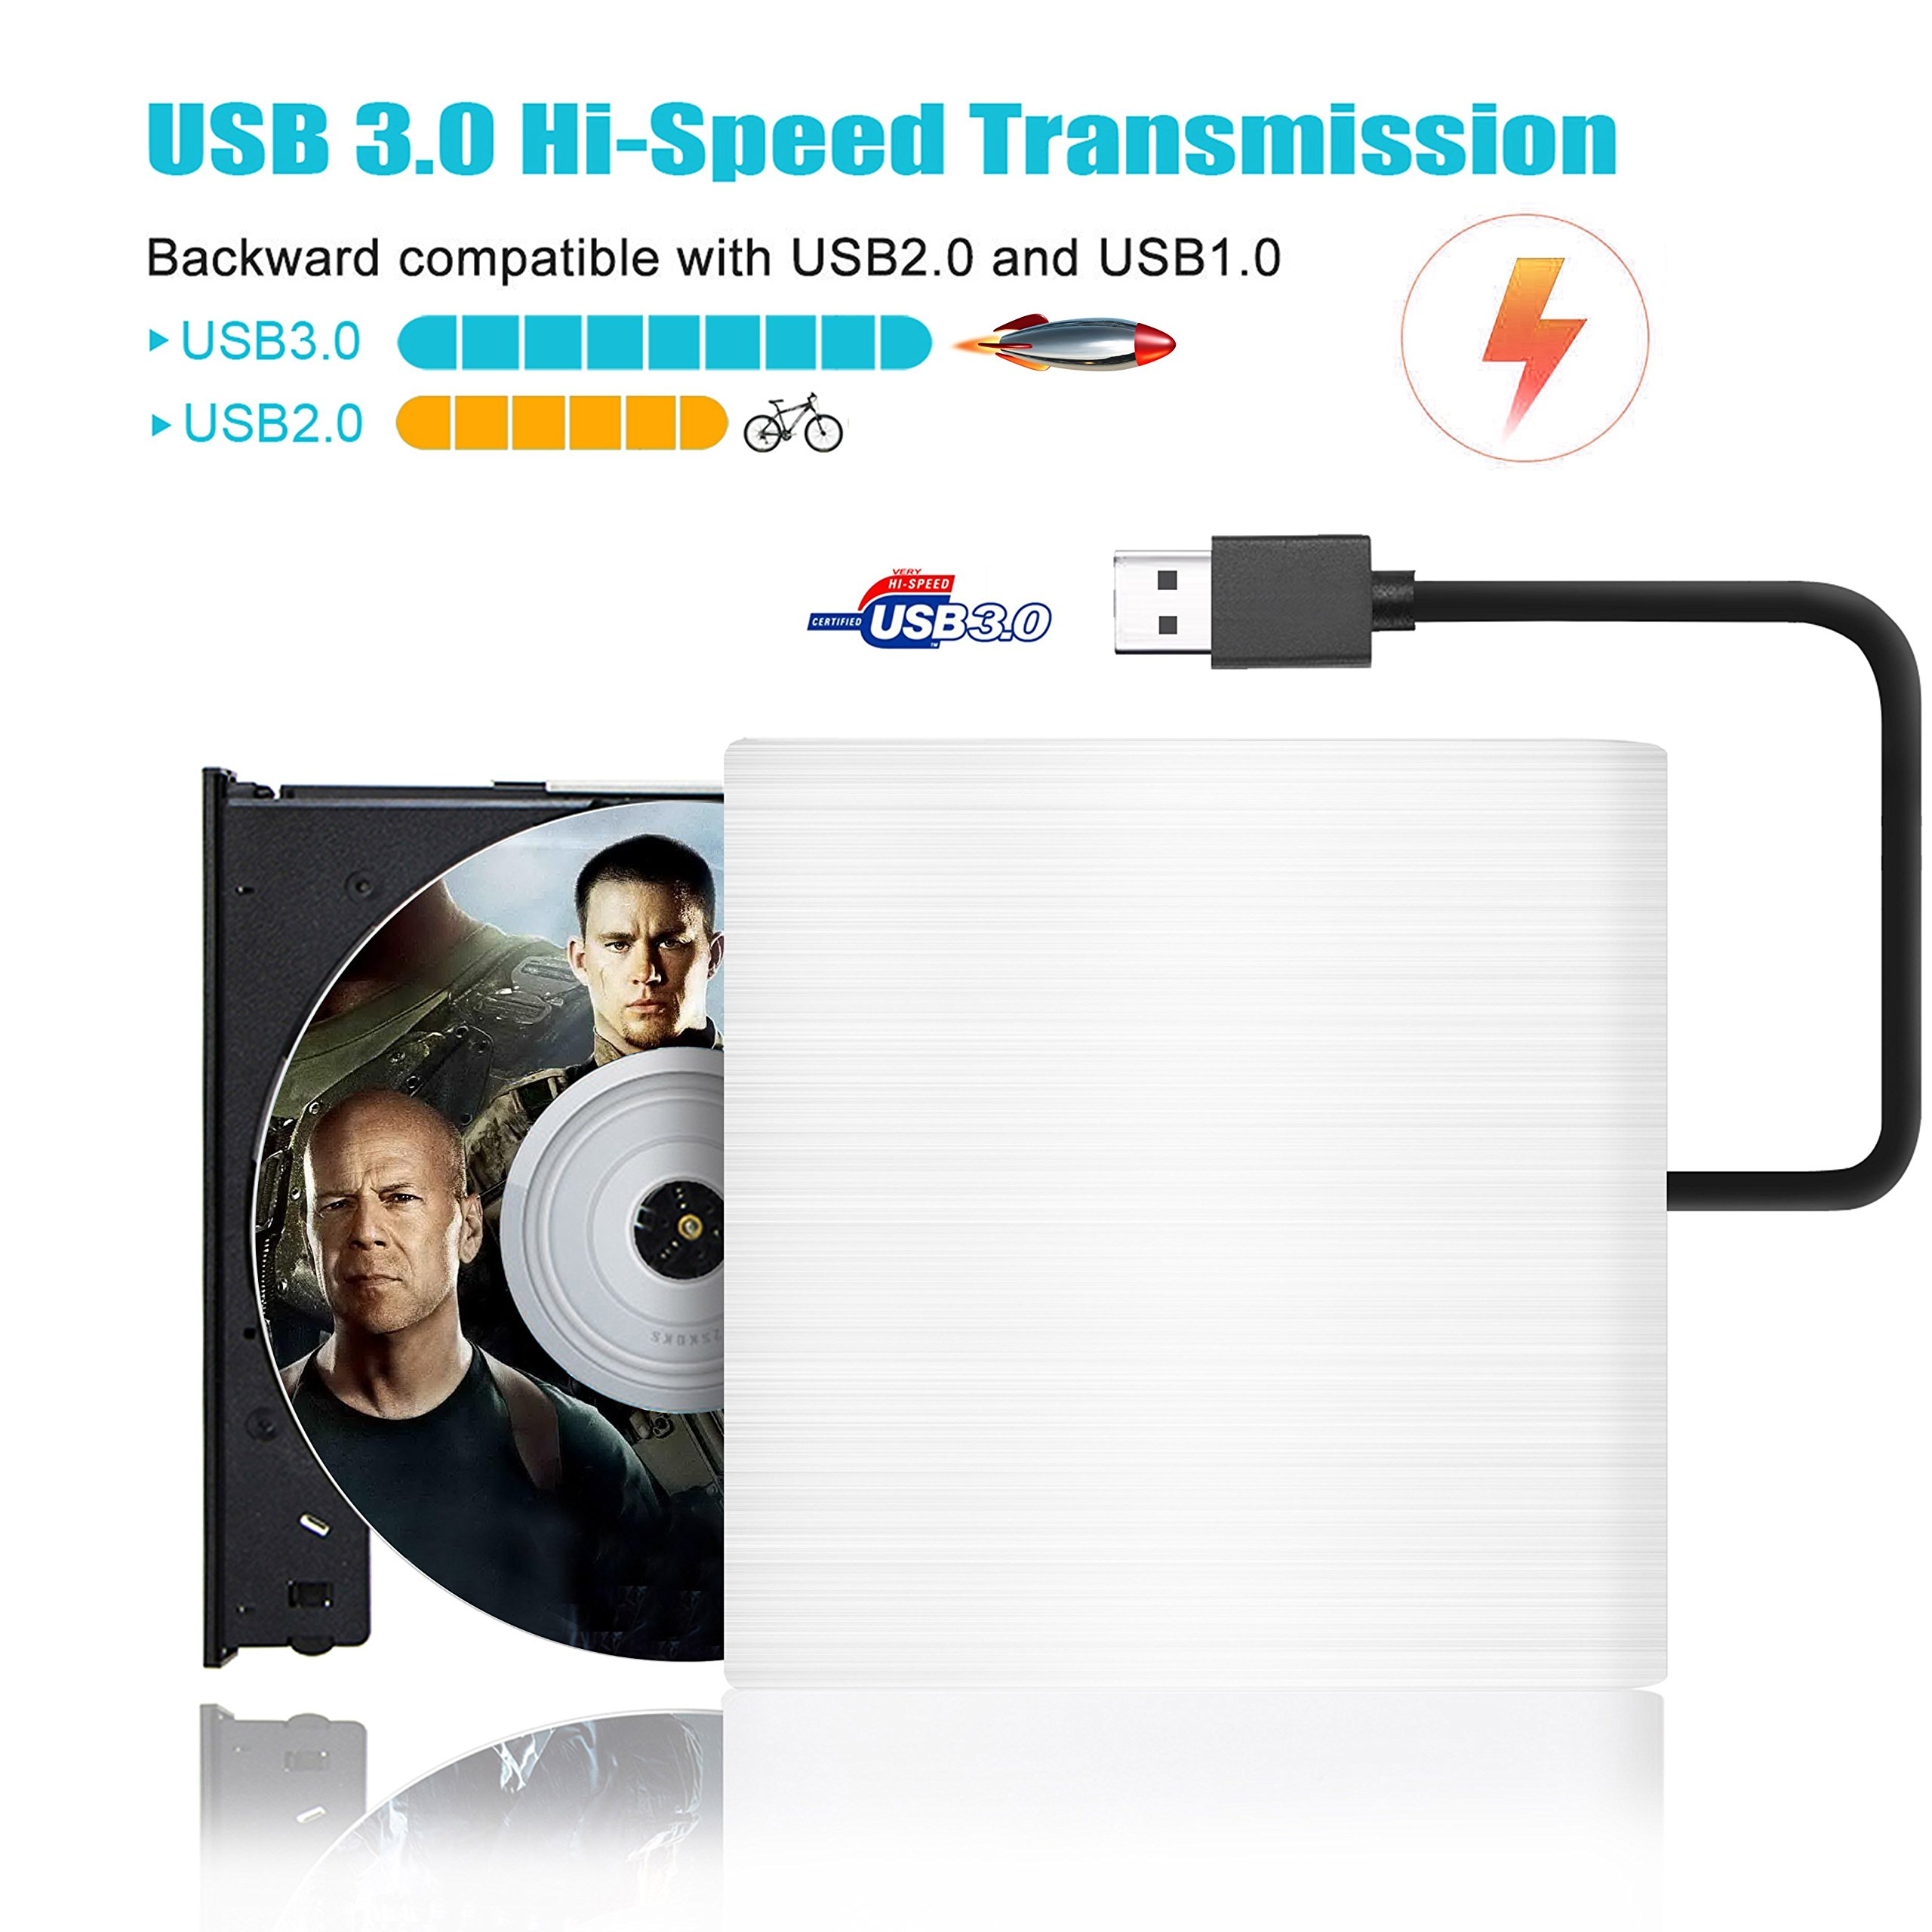 USB 3.0 External CD DVD Drive,2018 Upgraded Version Portable External DVD-RW Superdrive Burner For PC Desktop Laptop/Windows/Linux/Mac OS System by Valoin (Image #2)